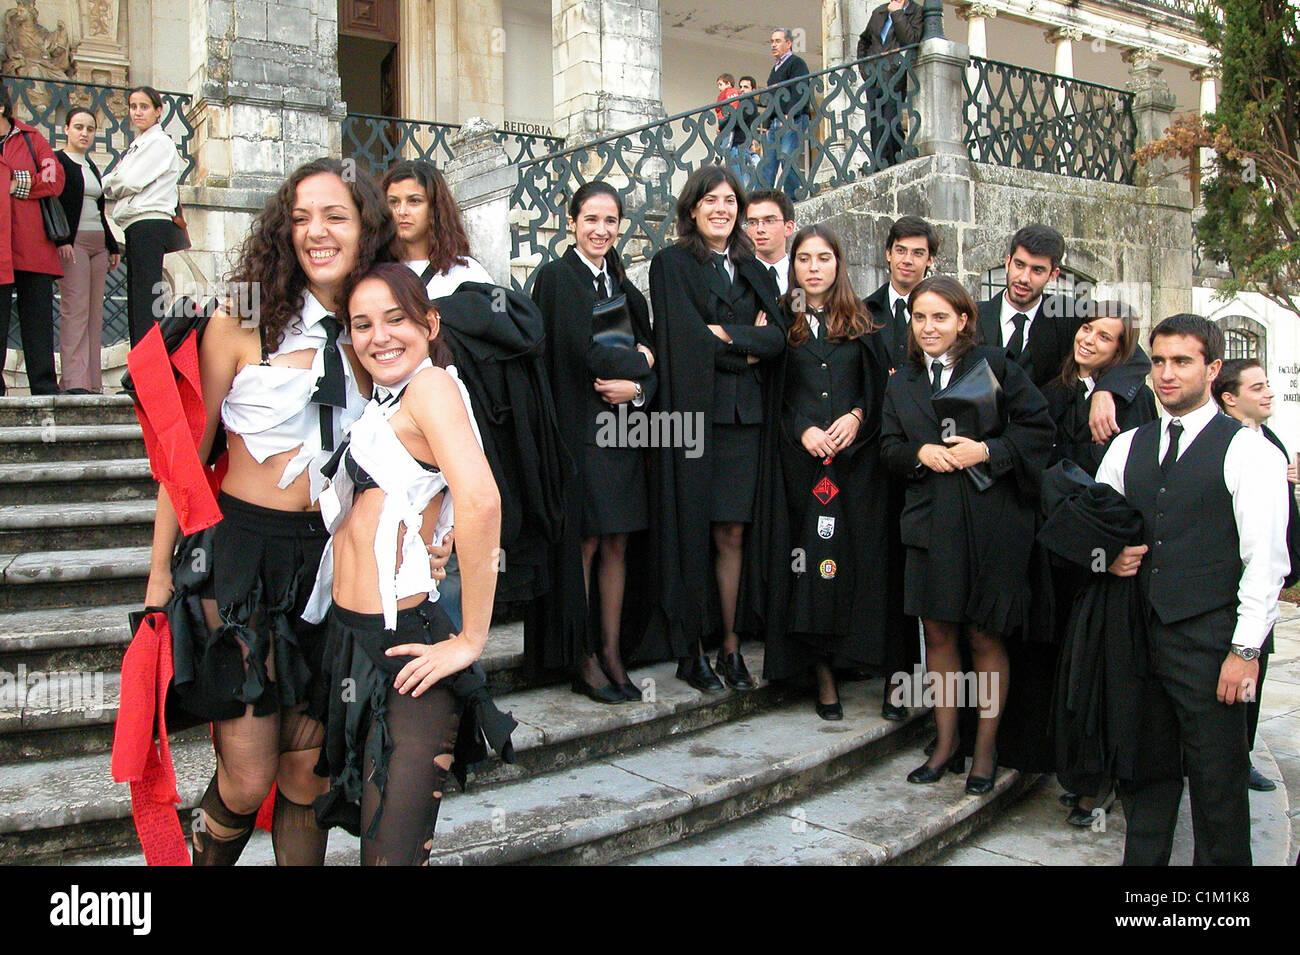 Portugal Coimbra University a welcome to the new university students (caloiros) ragging during the Latada or Festa das Latas Stock Photo